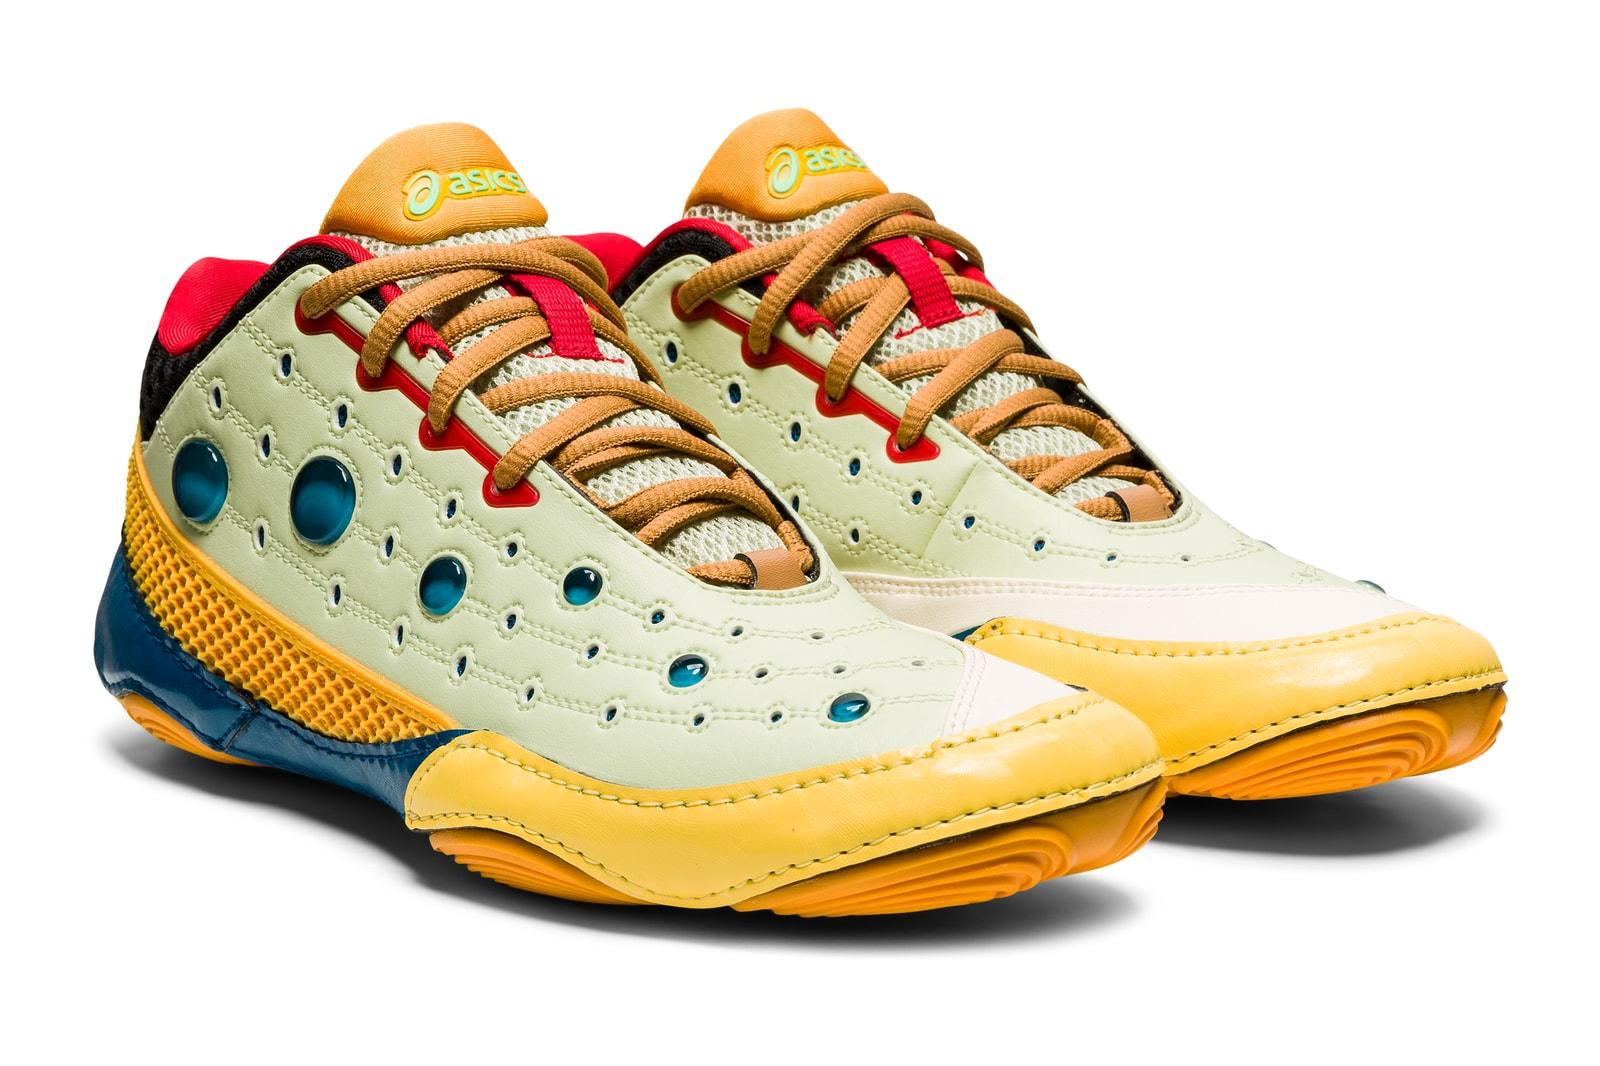 Kiko Kostadinov x ASICS 2020 春夏系列 GESSIRITTM II 鞋款正式登场